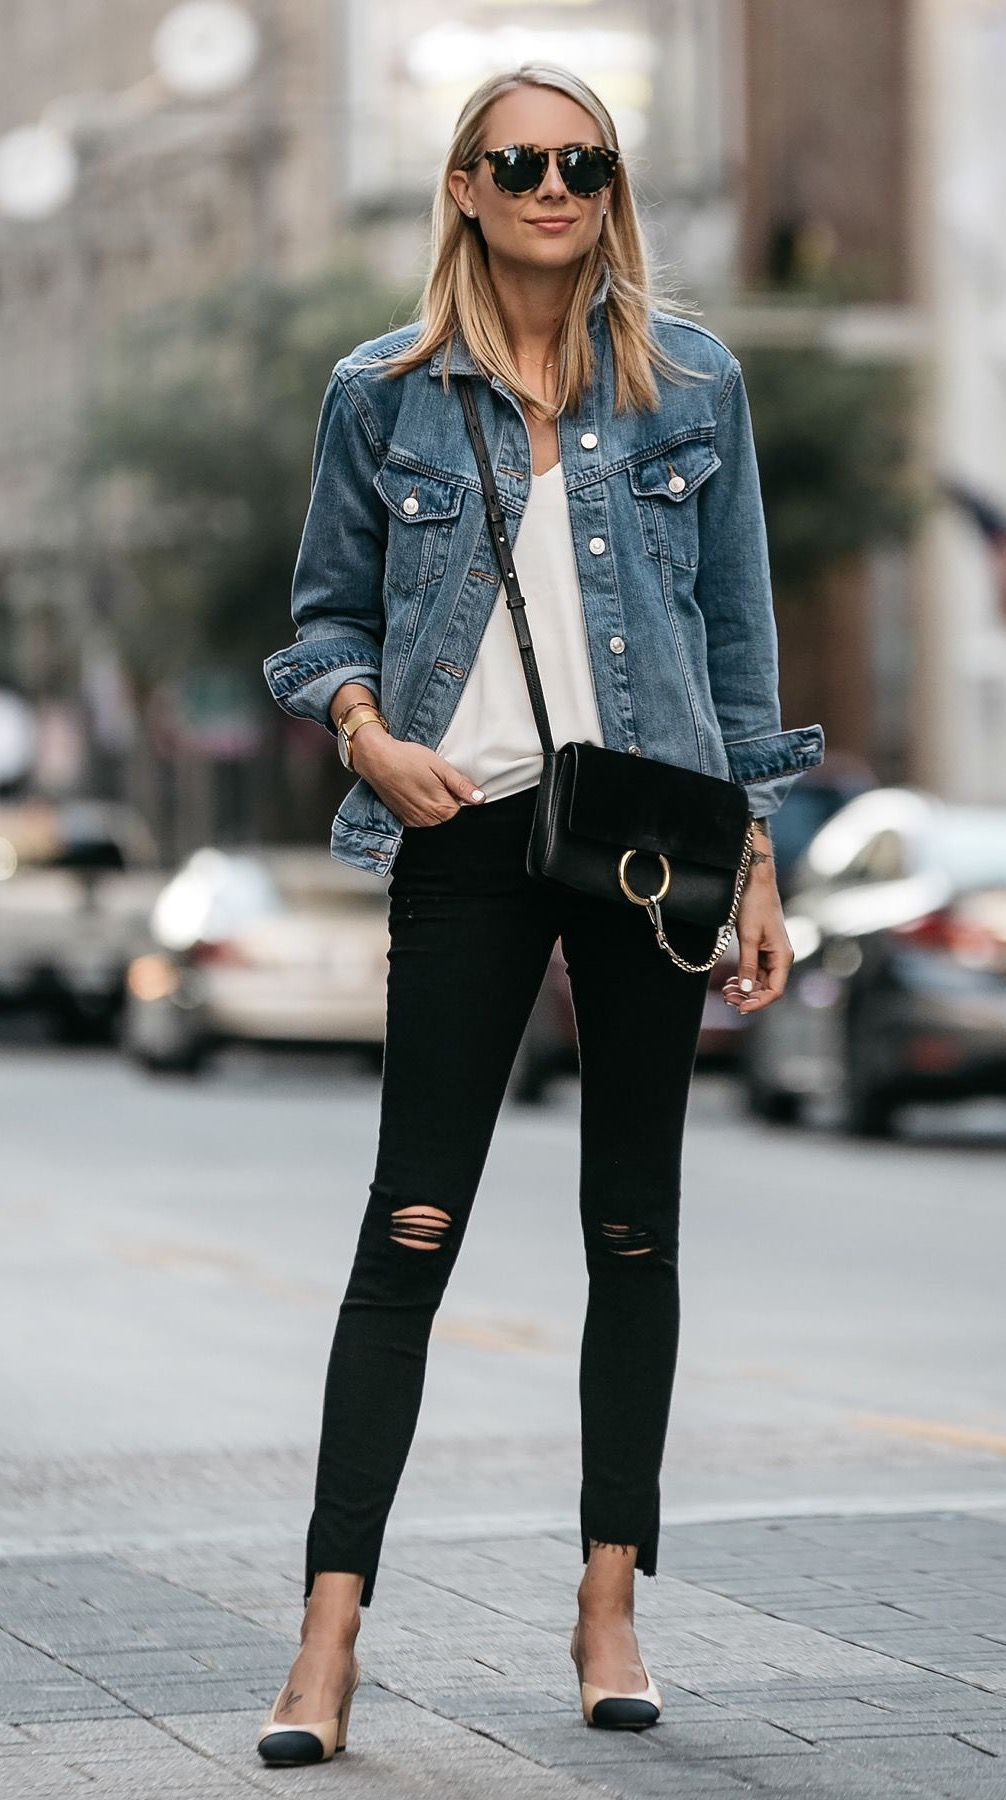 Denim Jacket Black Ripped Jeans Heels Chloe Small Faye Fashion Jackson Fashion Jackson Jean Jacket Outfits Skinny Jeans Style [ 1800 x 1006 Pixel ]